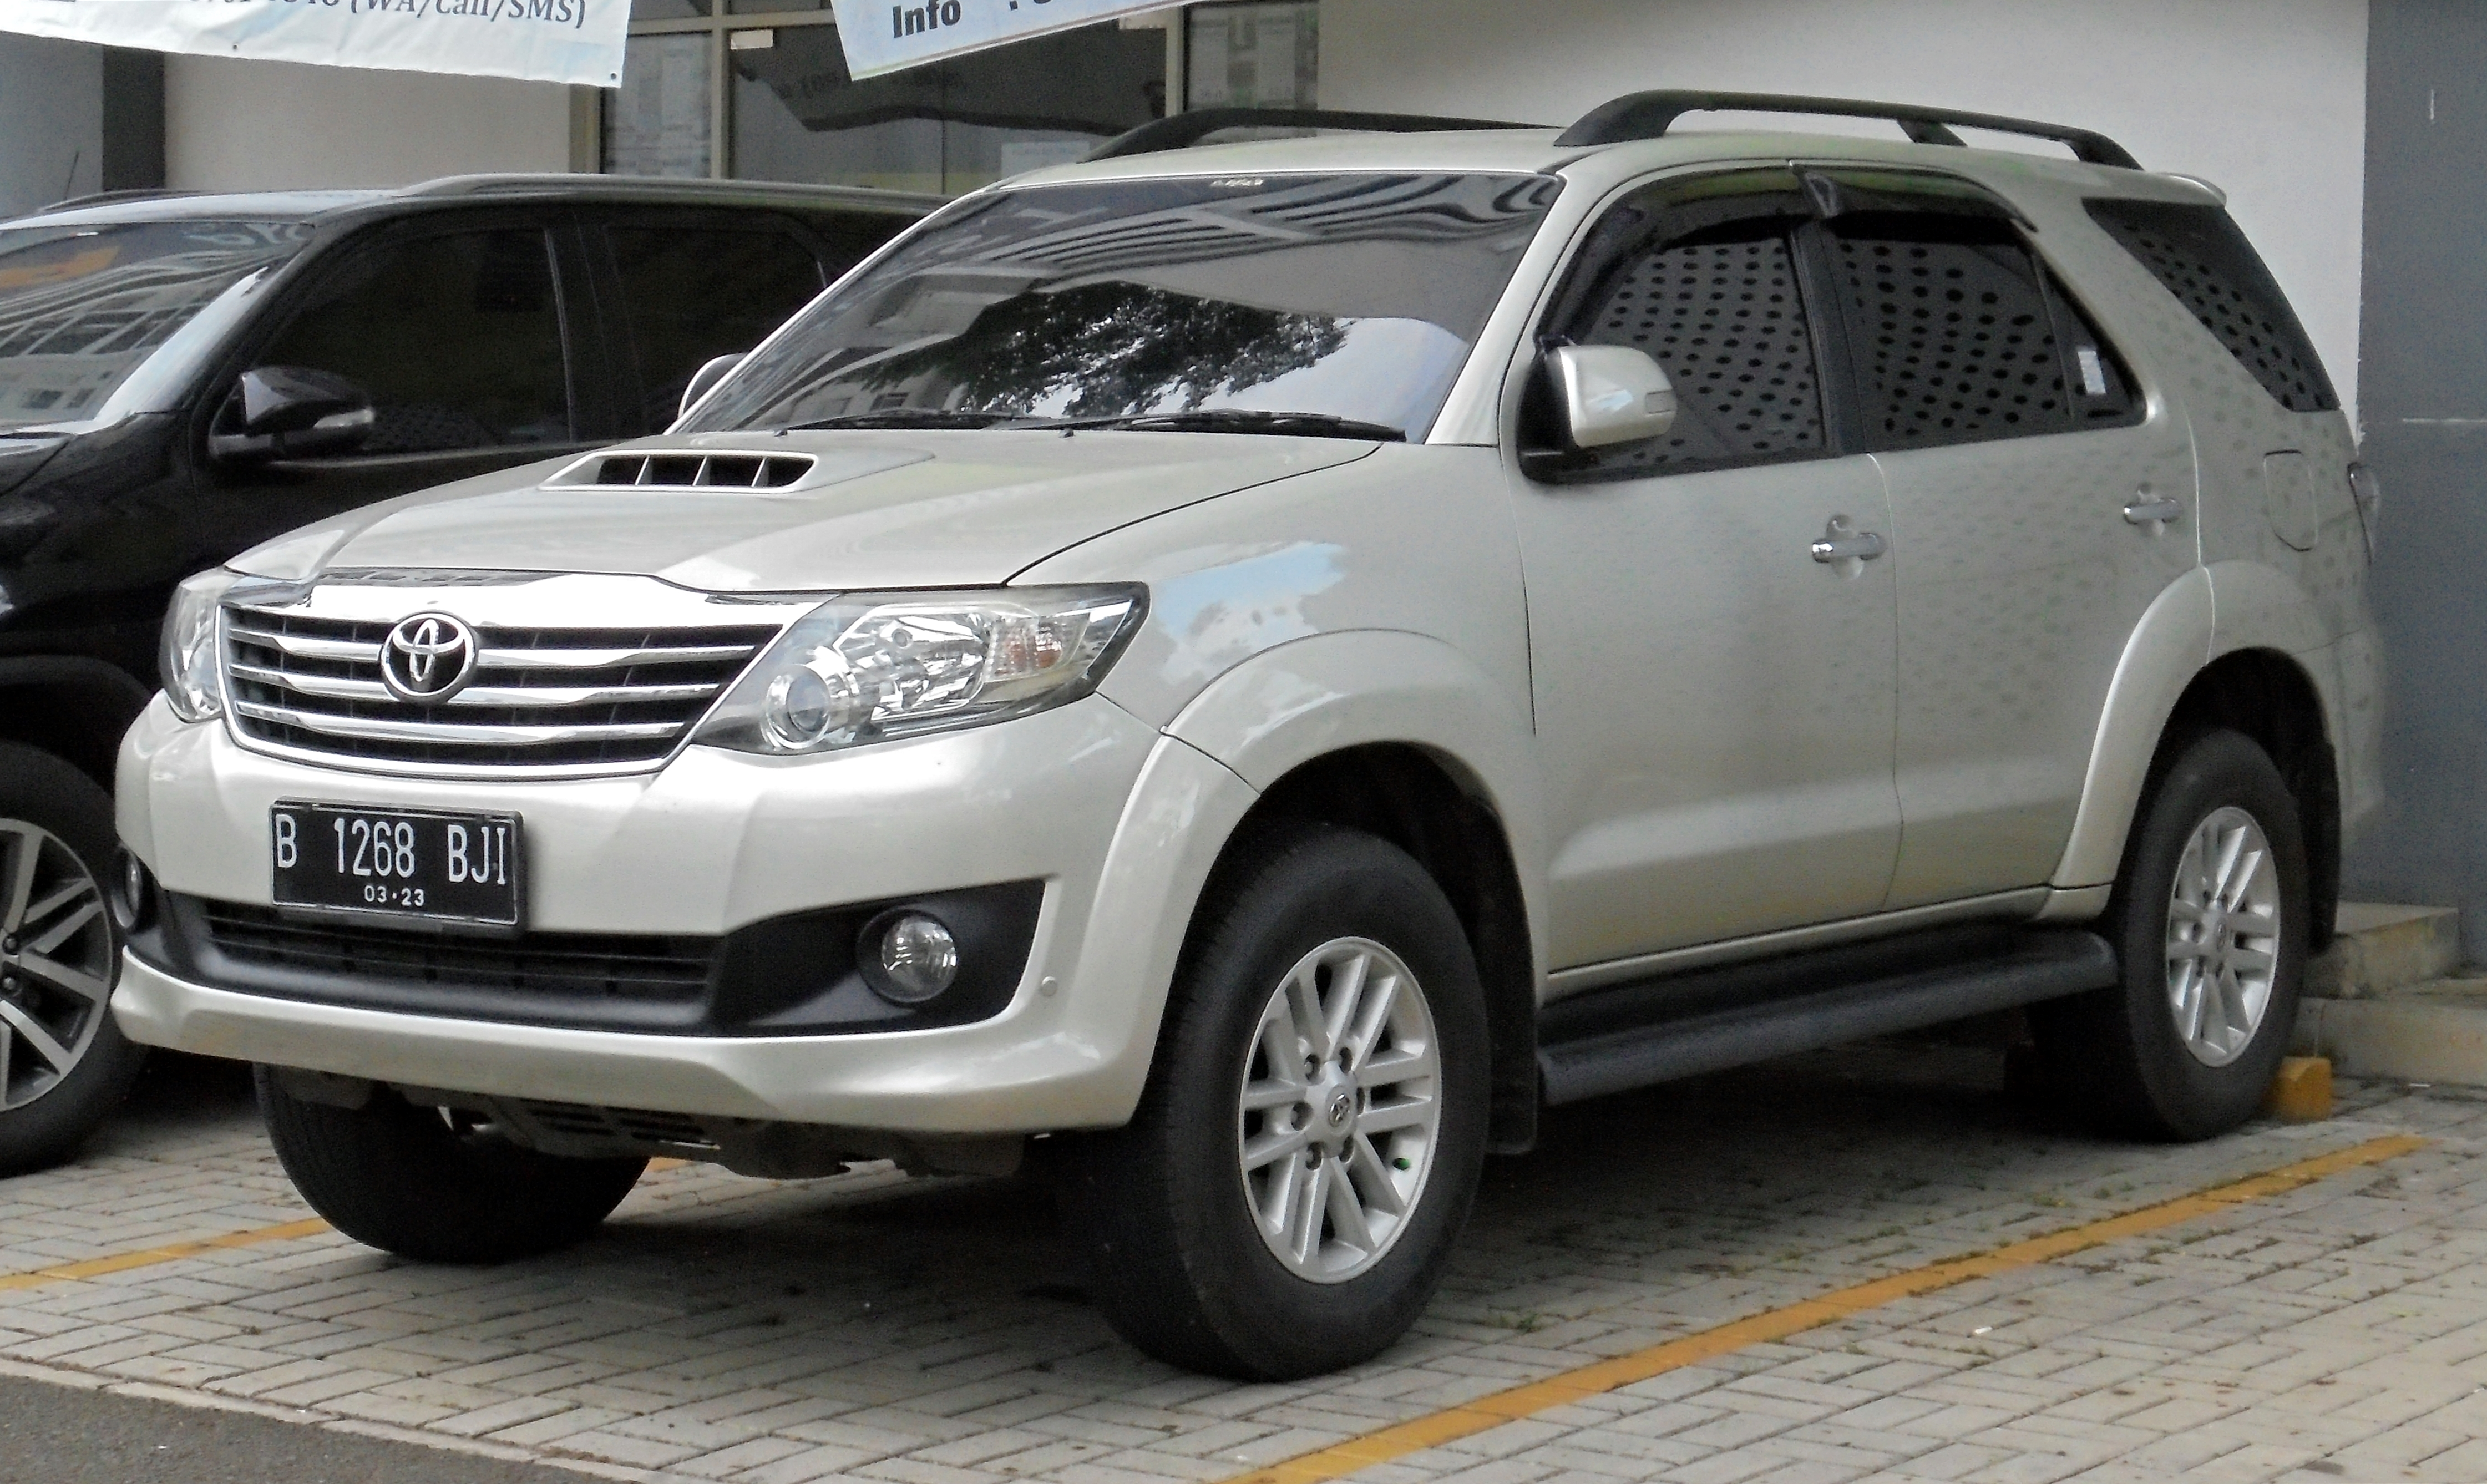 File:2013 Toyota Fortuner 2.5 G wagon (KUN60; 12-16-2018